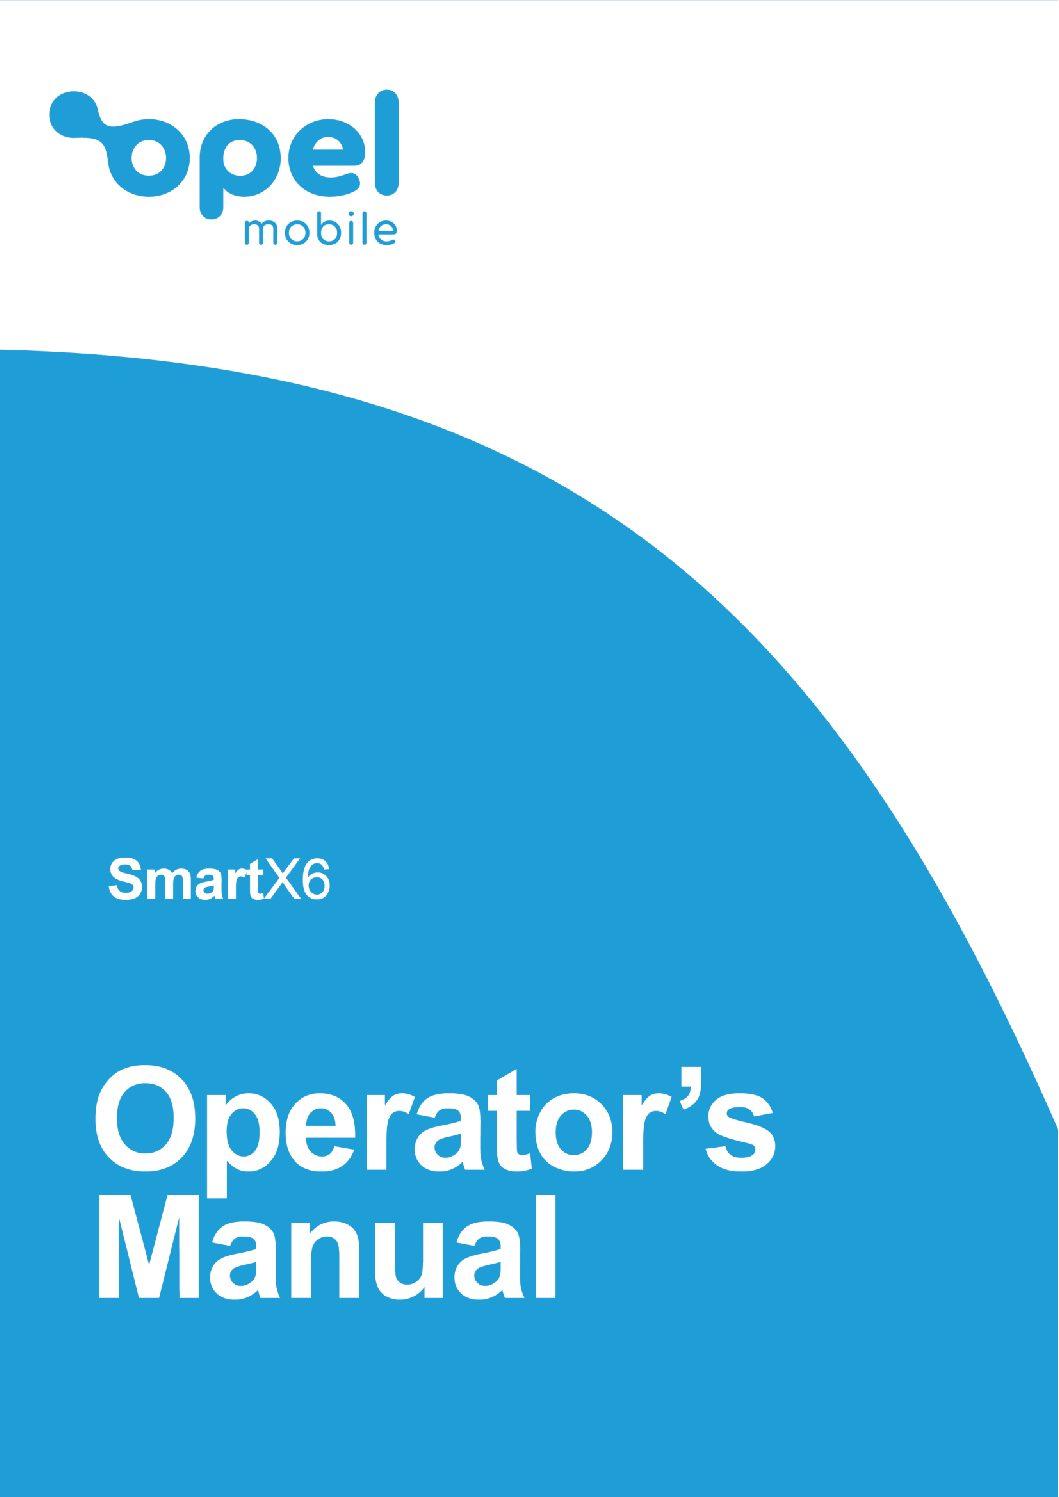 SmartX6 Operator's Manual